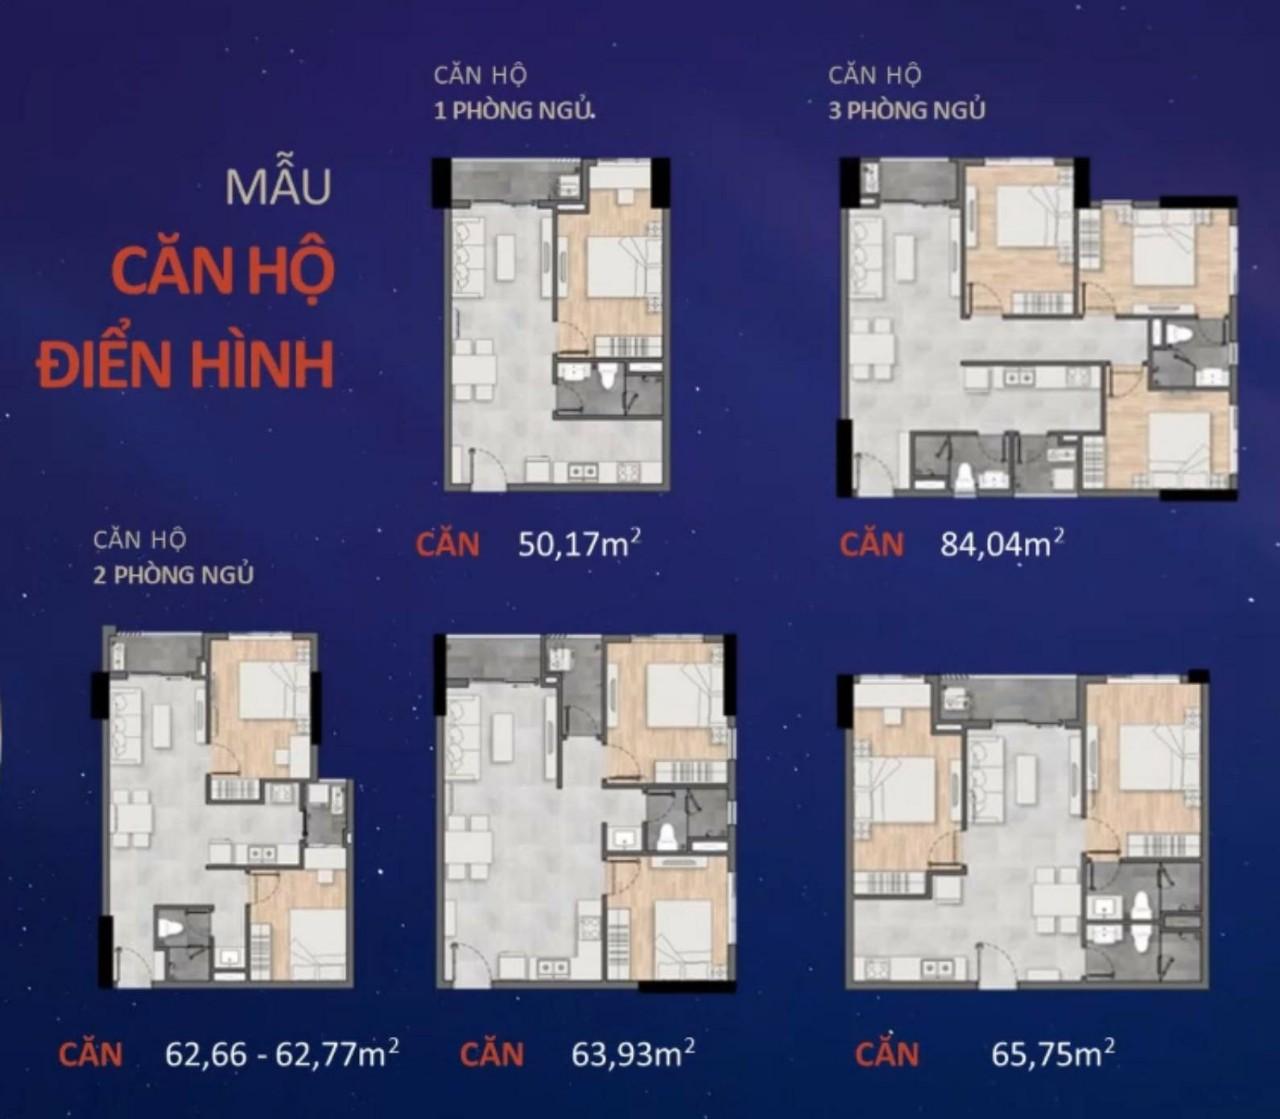 Thiết kế căn hộ New Galaxy